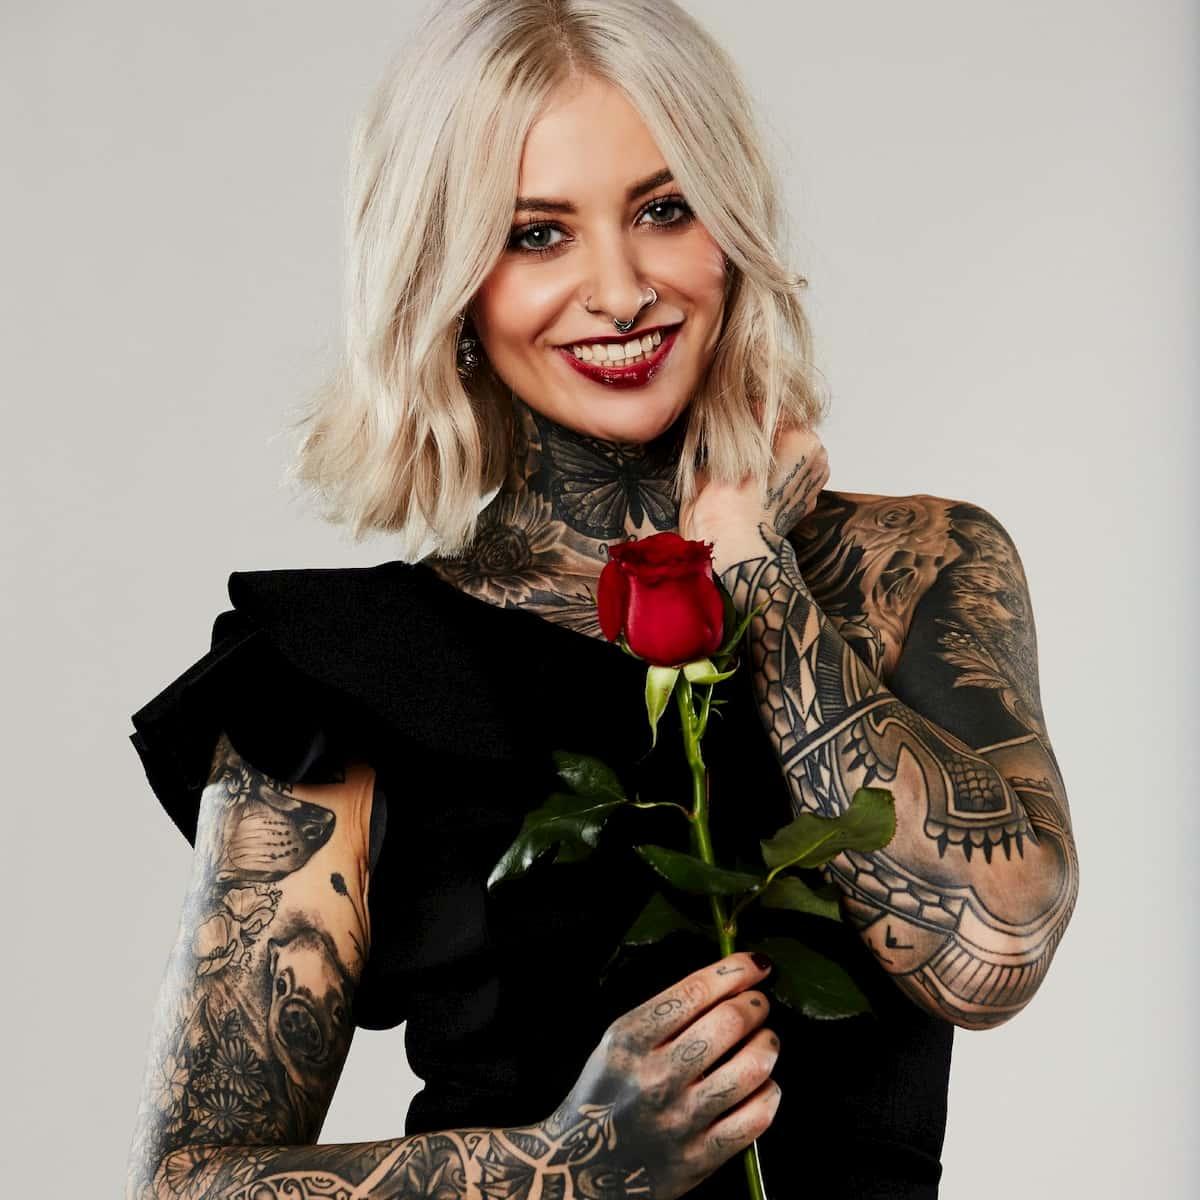 Jenny S - Kandidatin beim Bachelor 2020